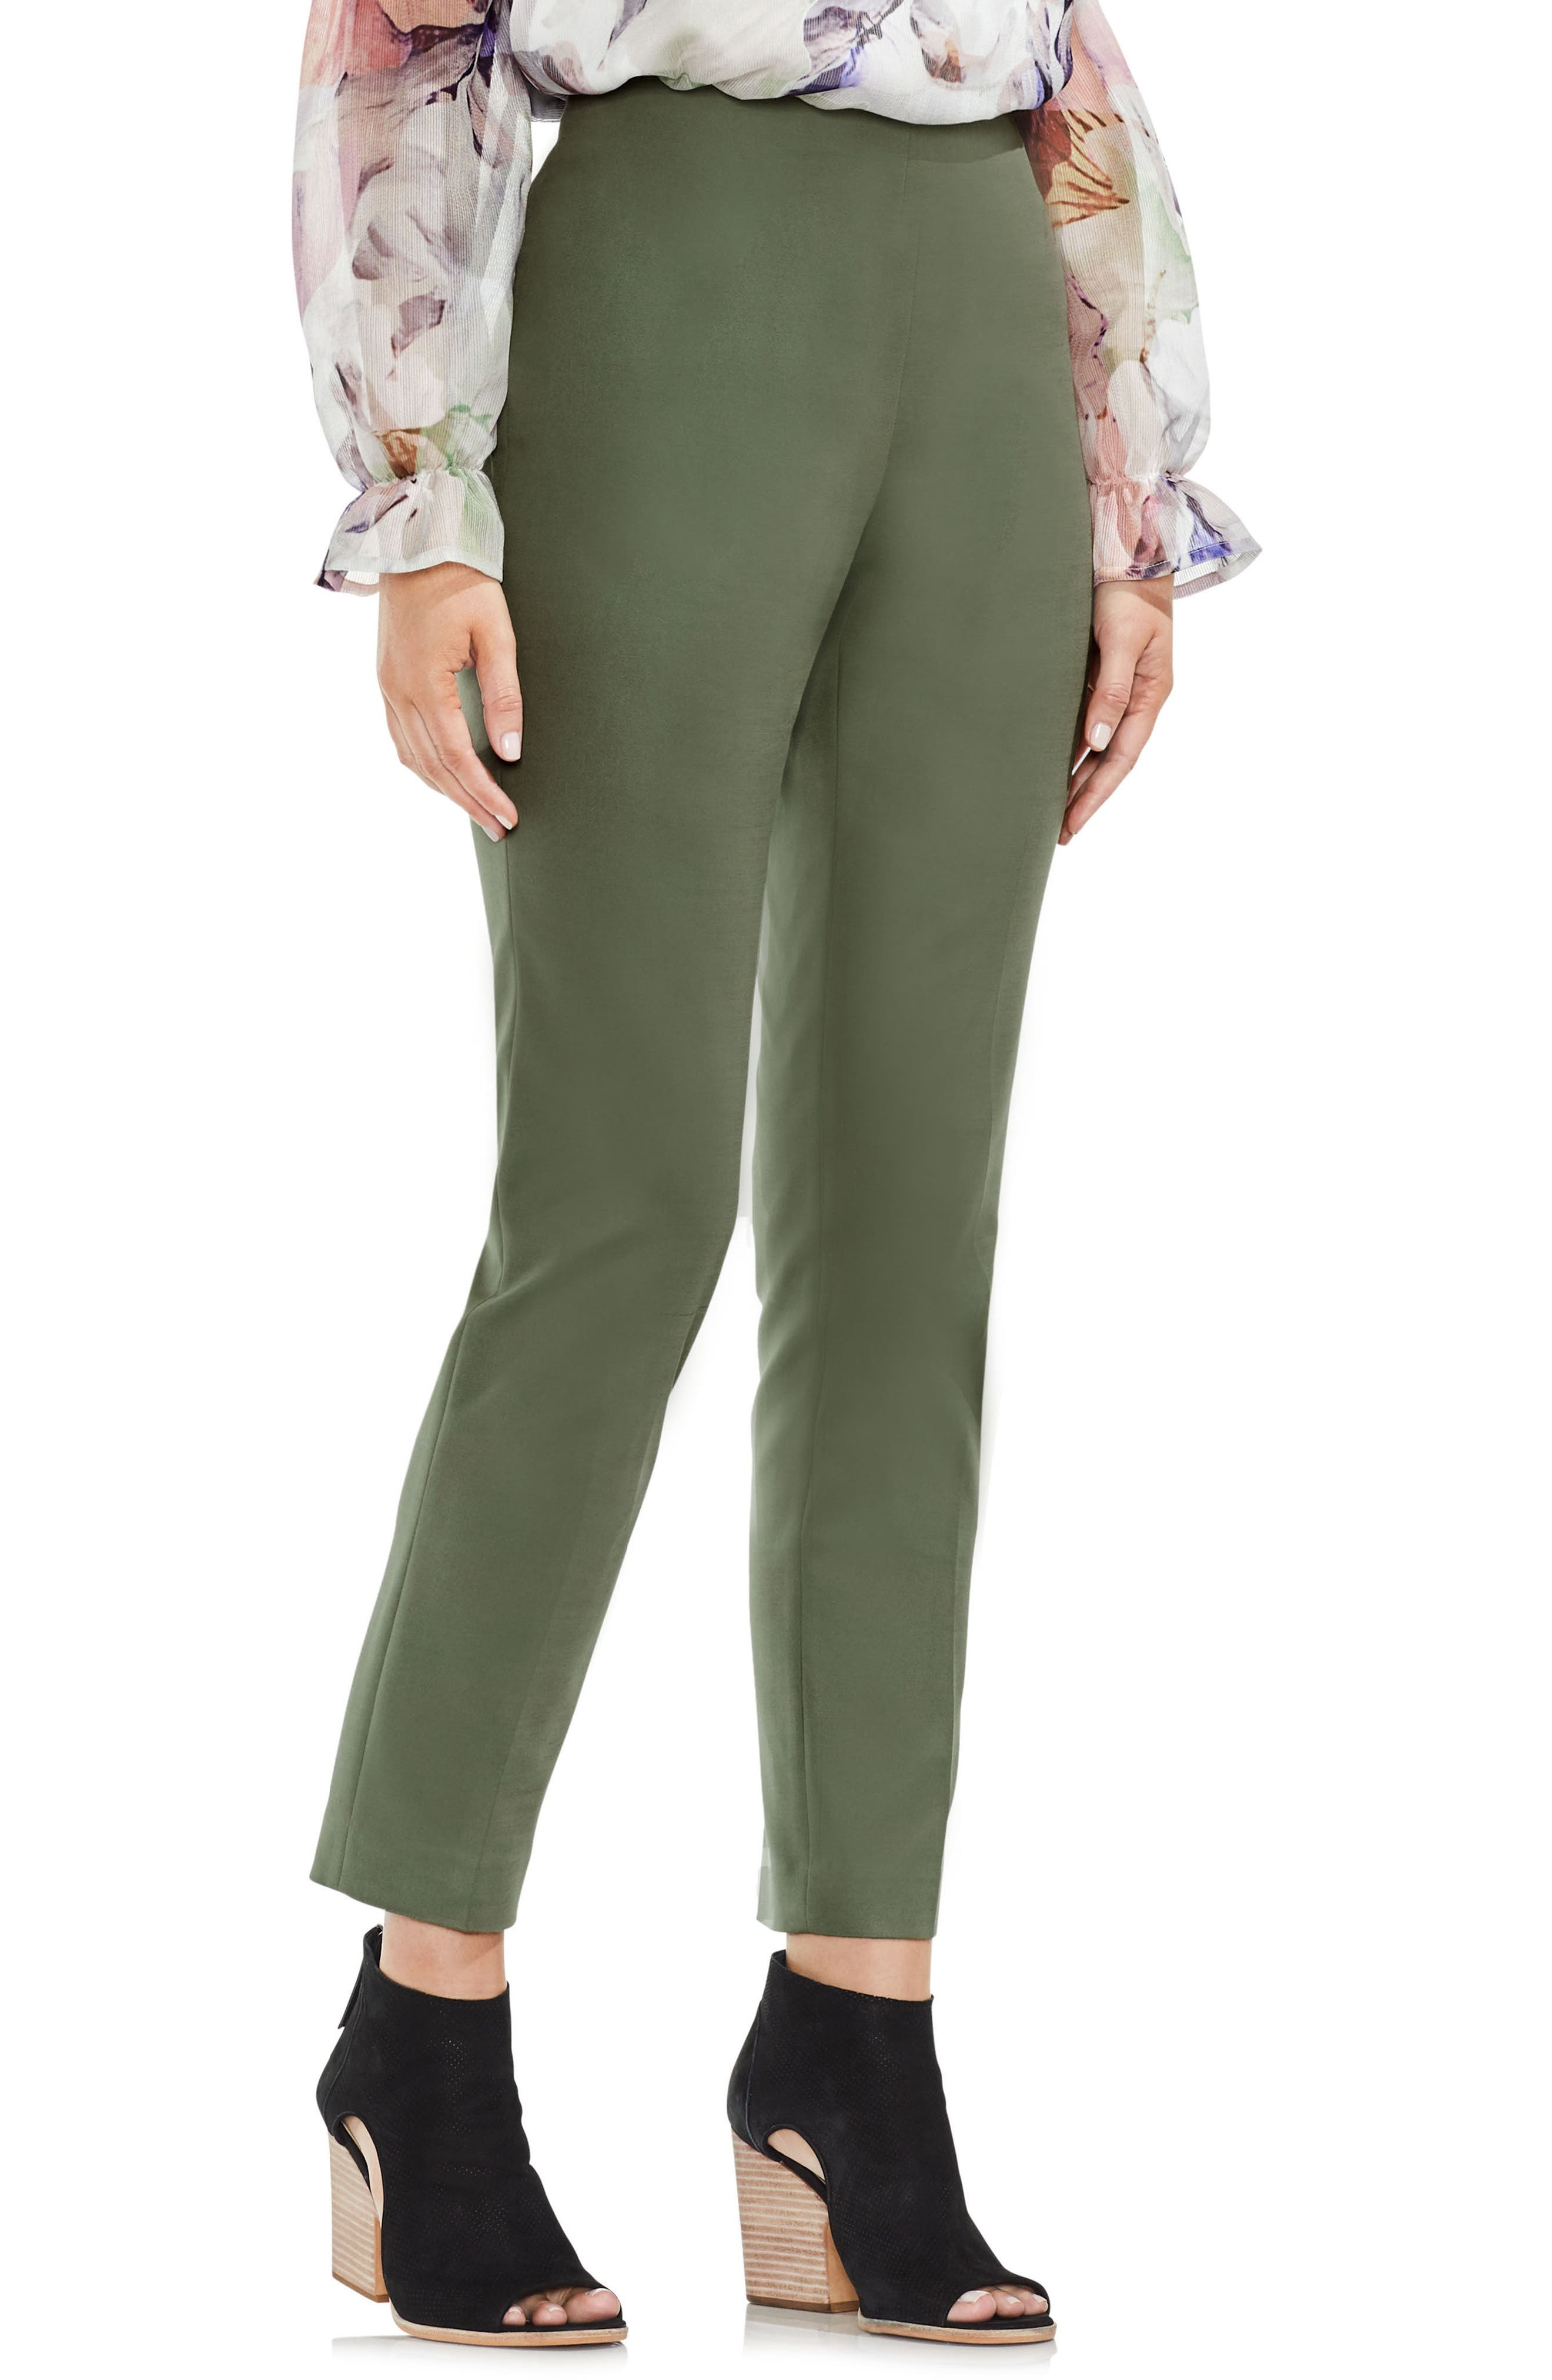 Vince Camuto Side Zip Double Weave Pants